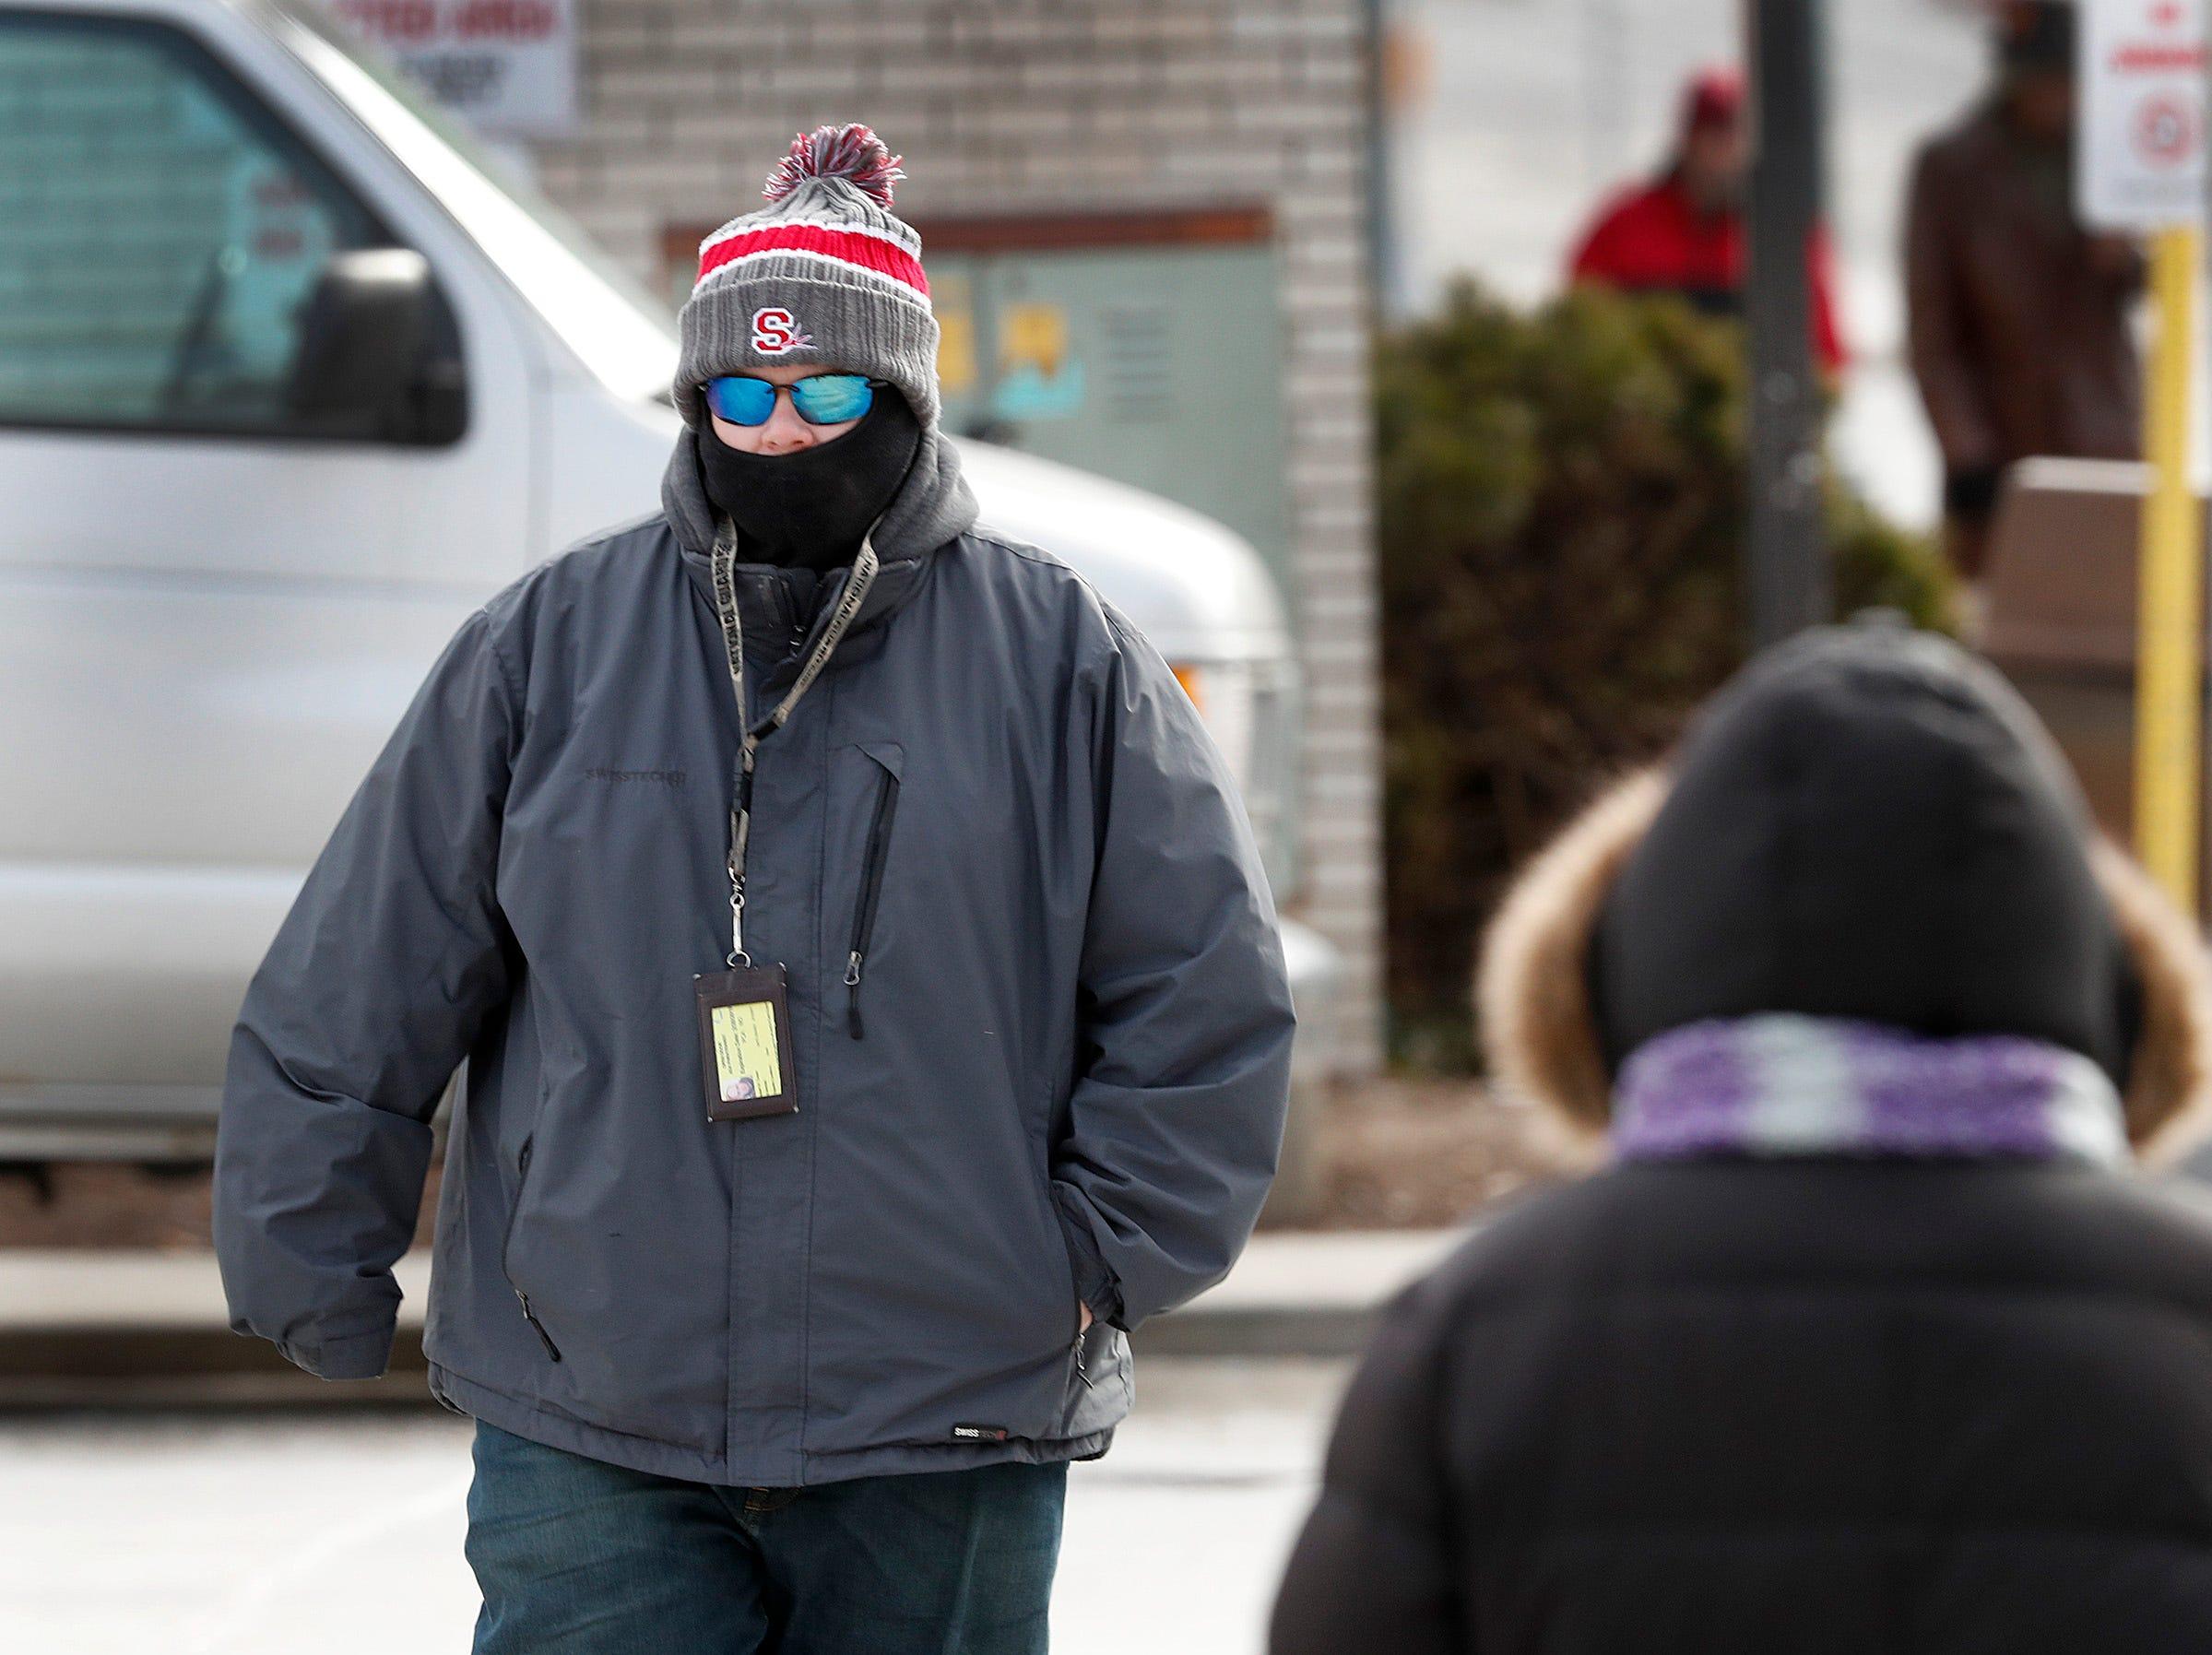 Pedestrians attempt to keep warm while walking near the Julia M. Carson Transit Center Tuesday, Jan. 29, 2019.